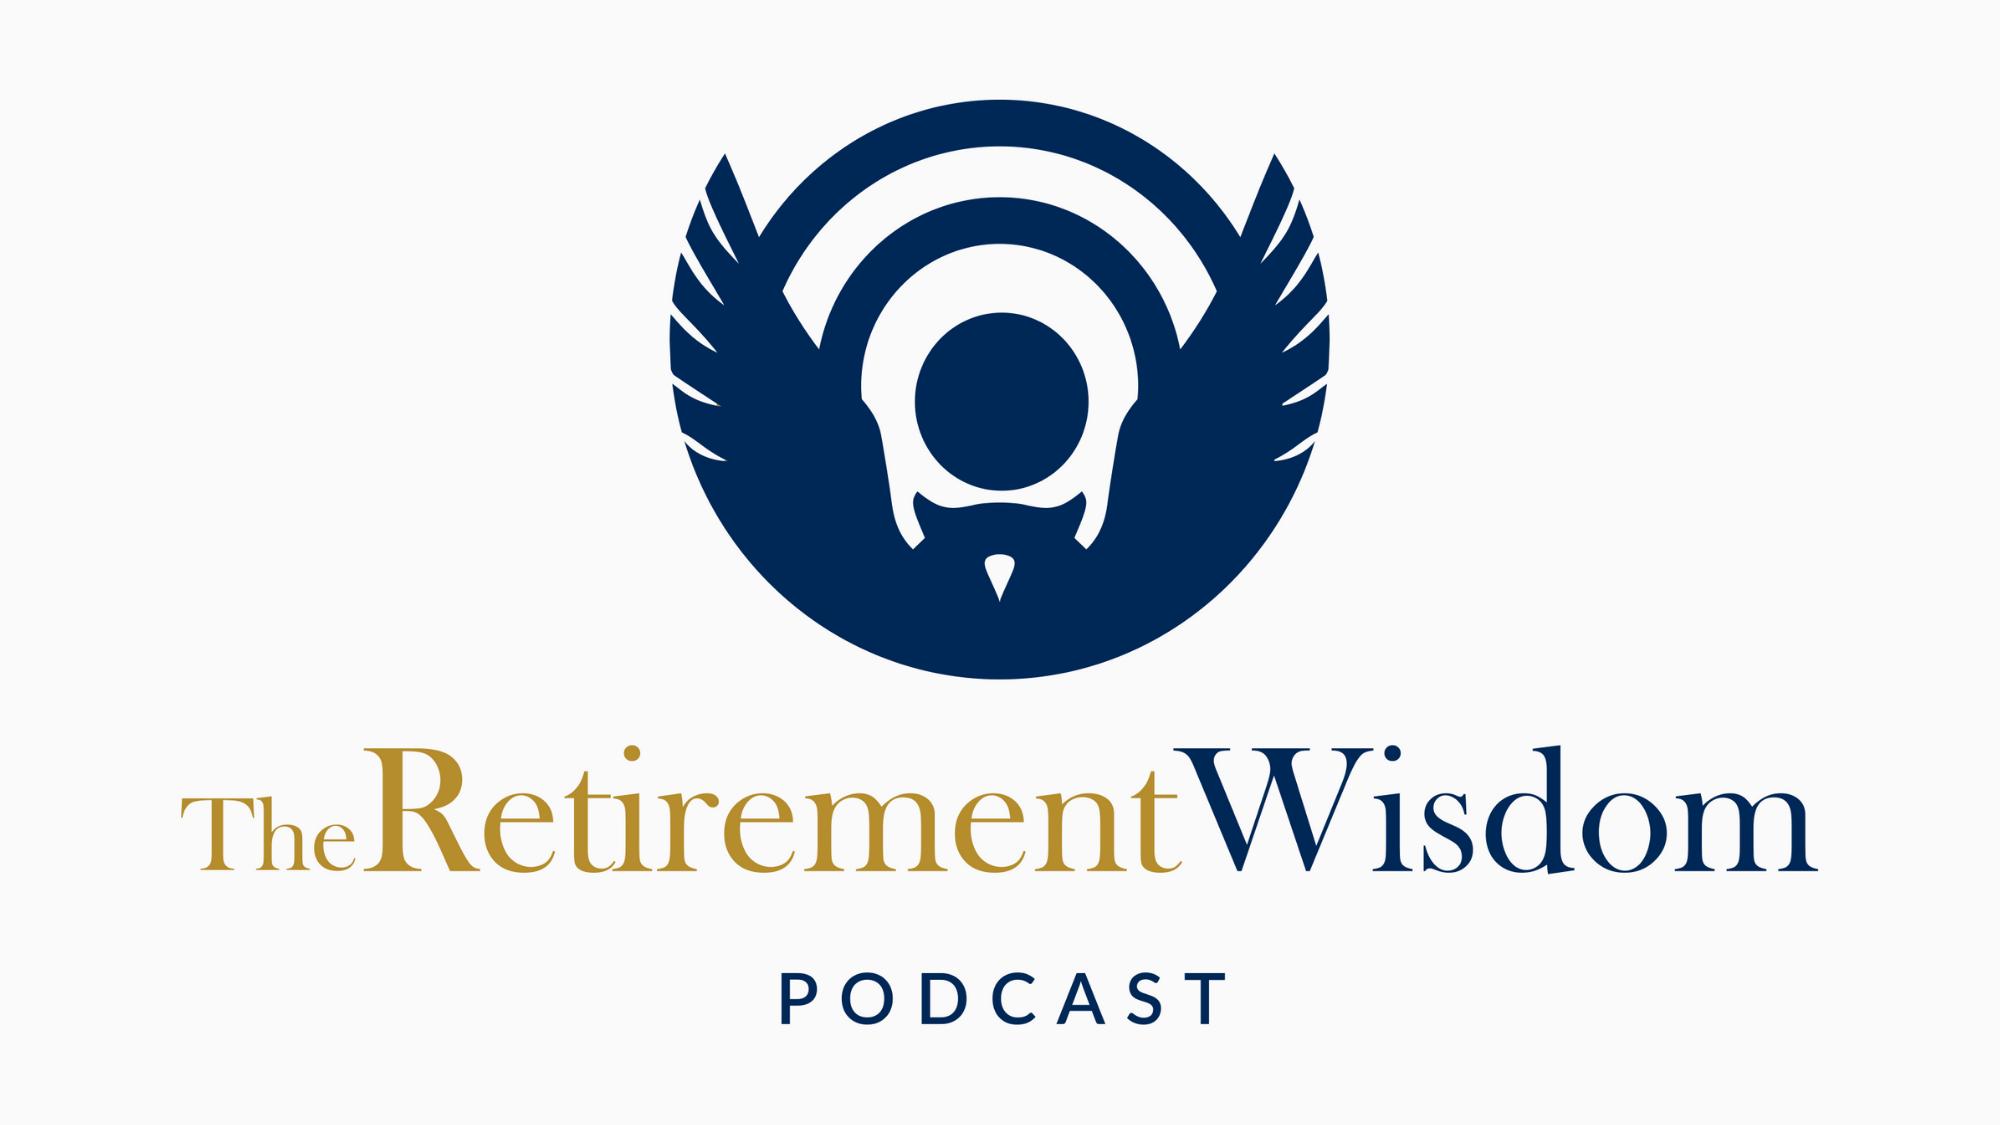 Retirement Wisdom Podcast Logo